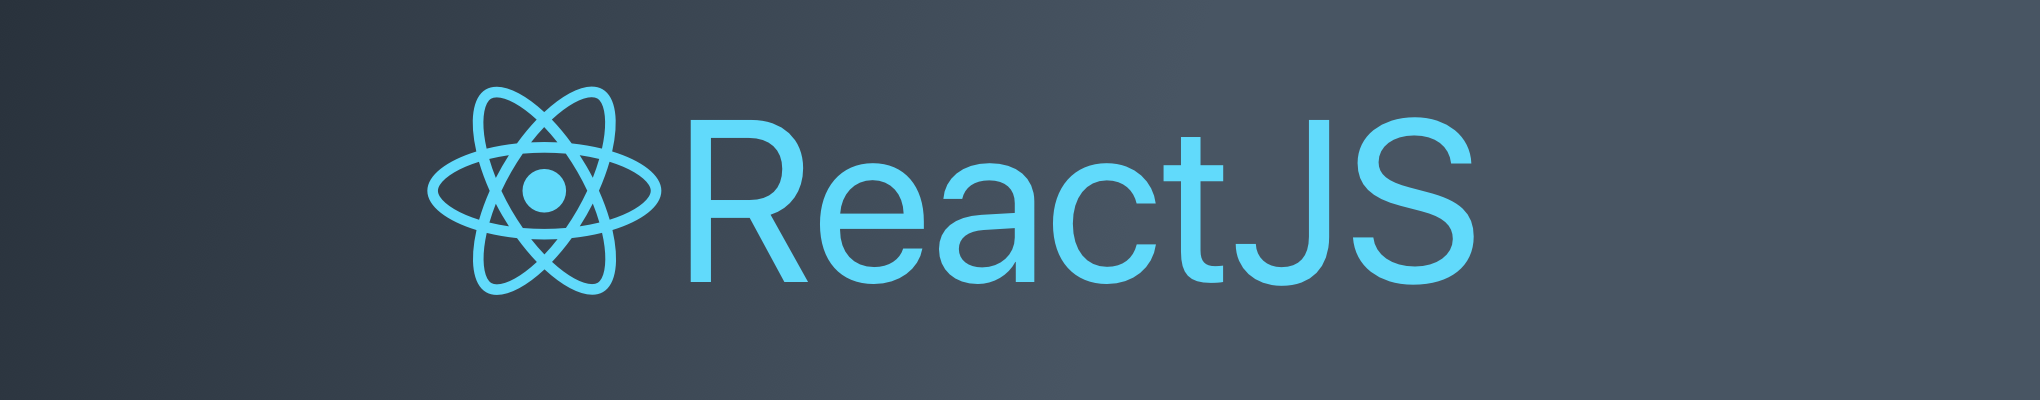 6 tips for better React performance